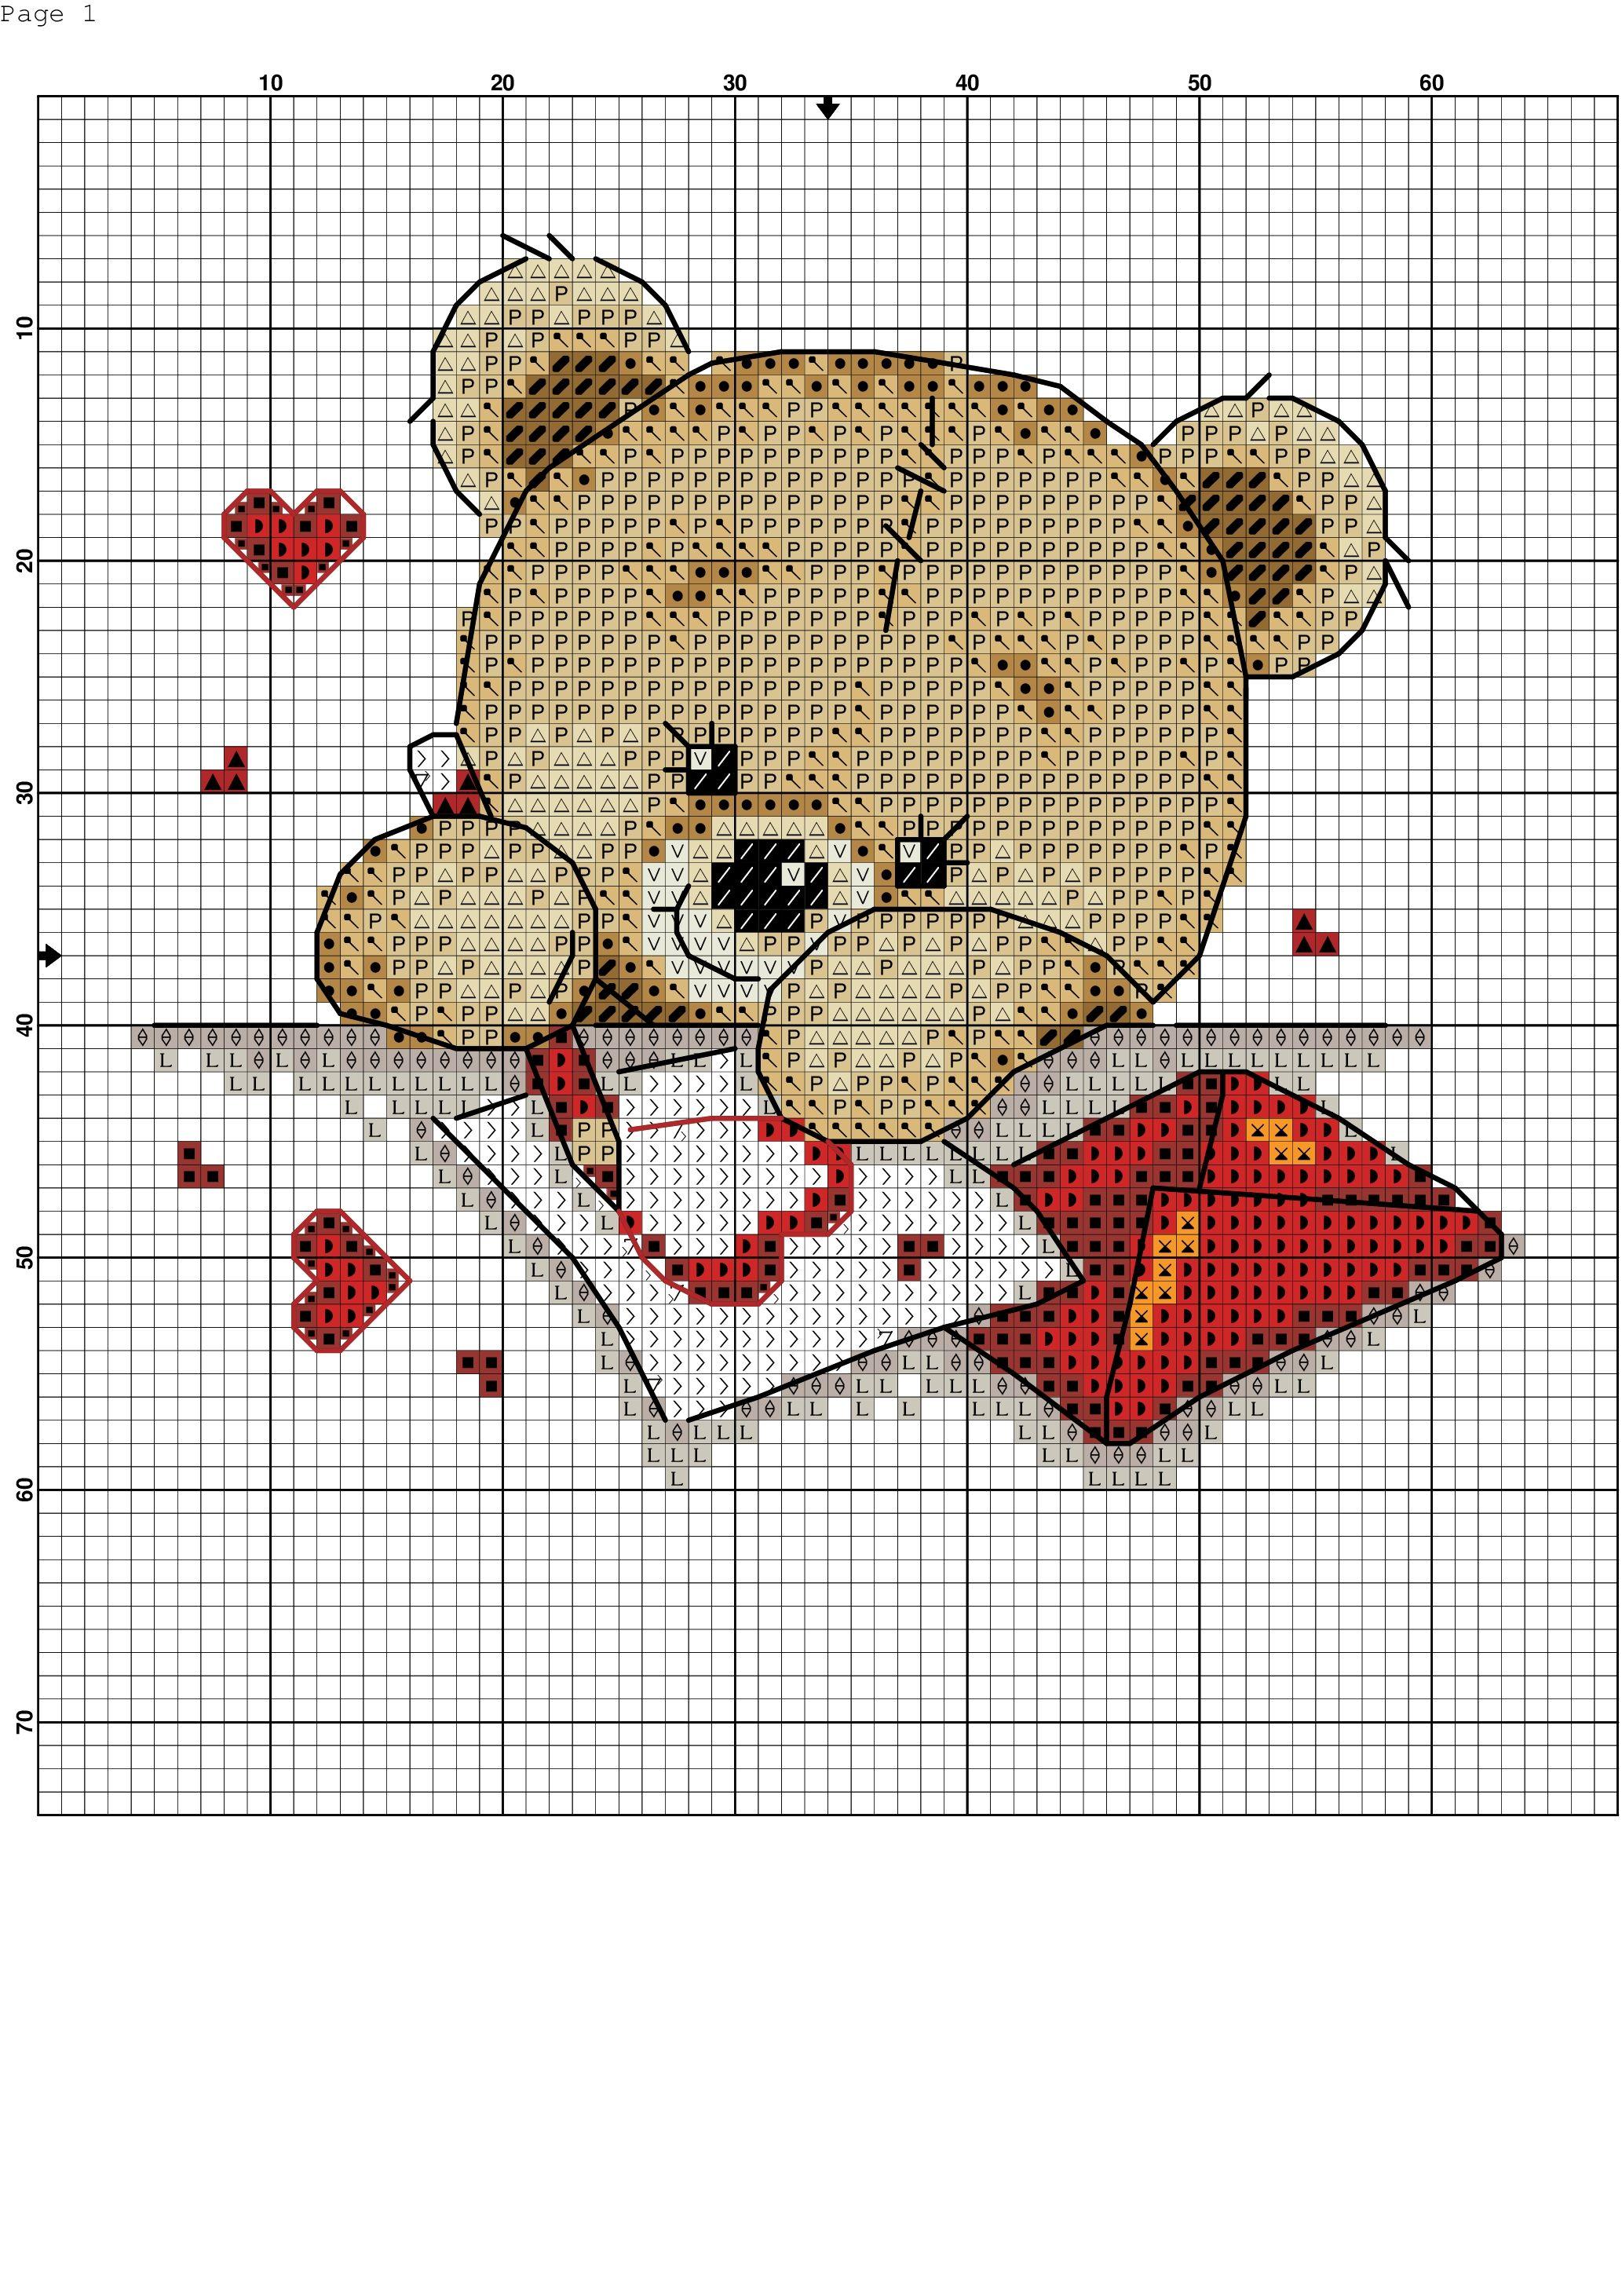 Pin de Andrea Ramirez en Mis puntos 2 ❤ | Cross stitch patterns ...